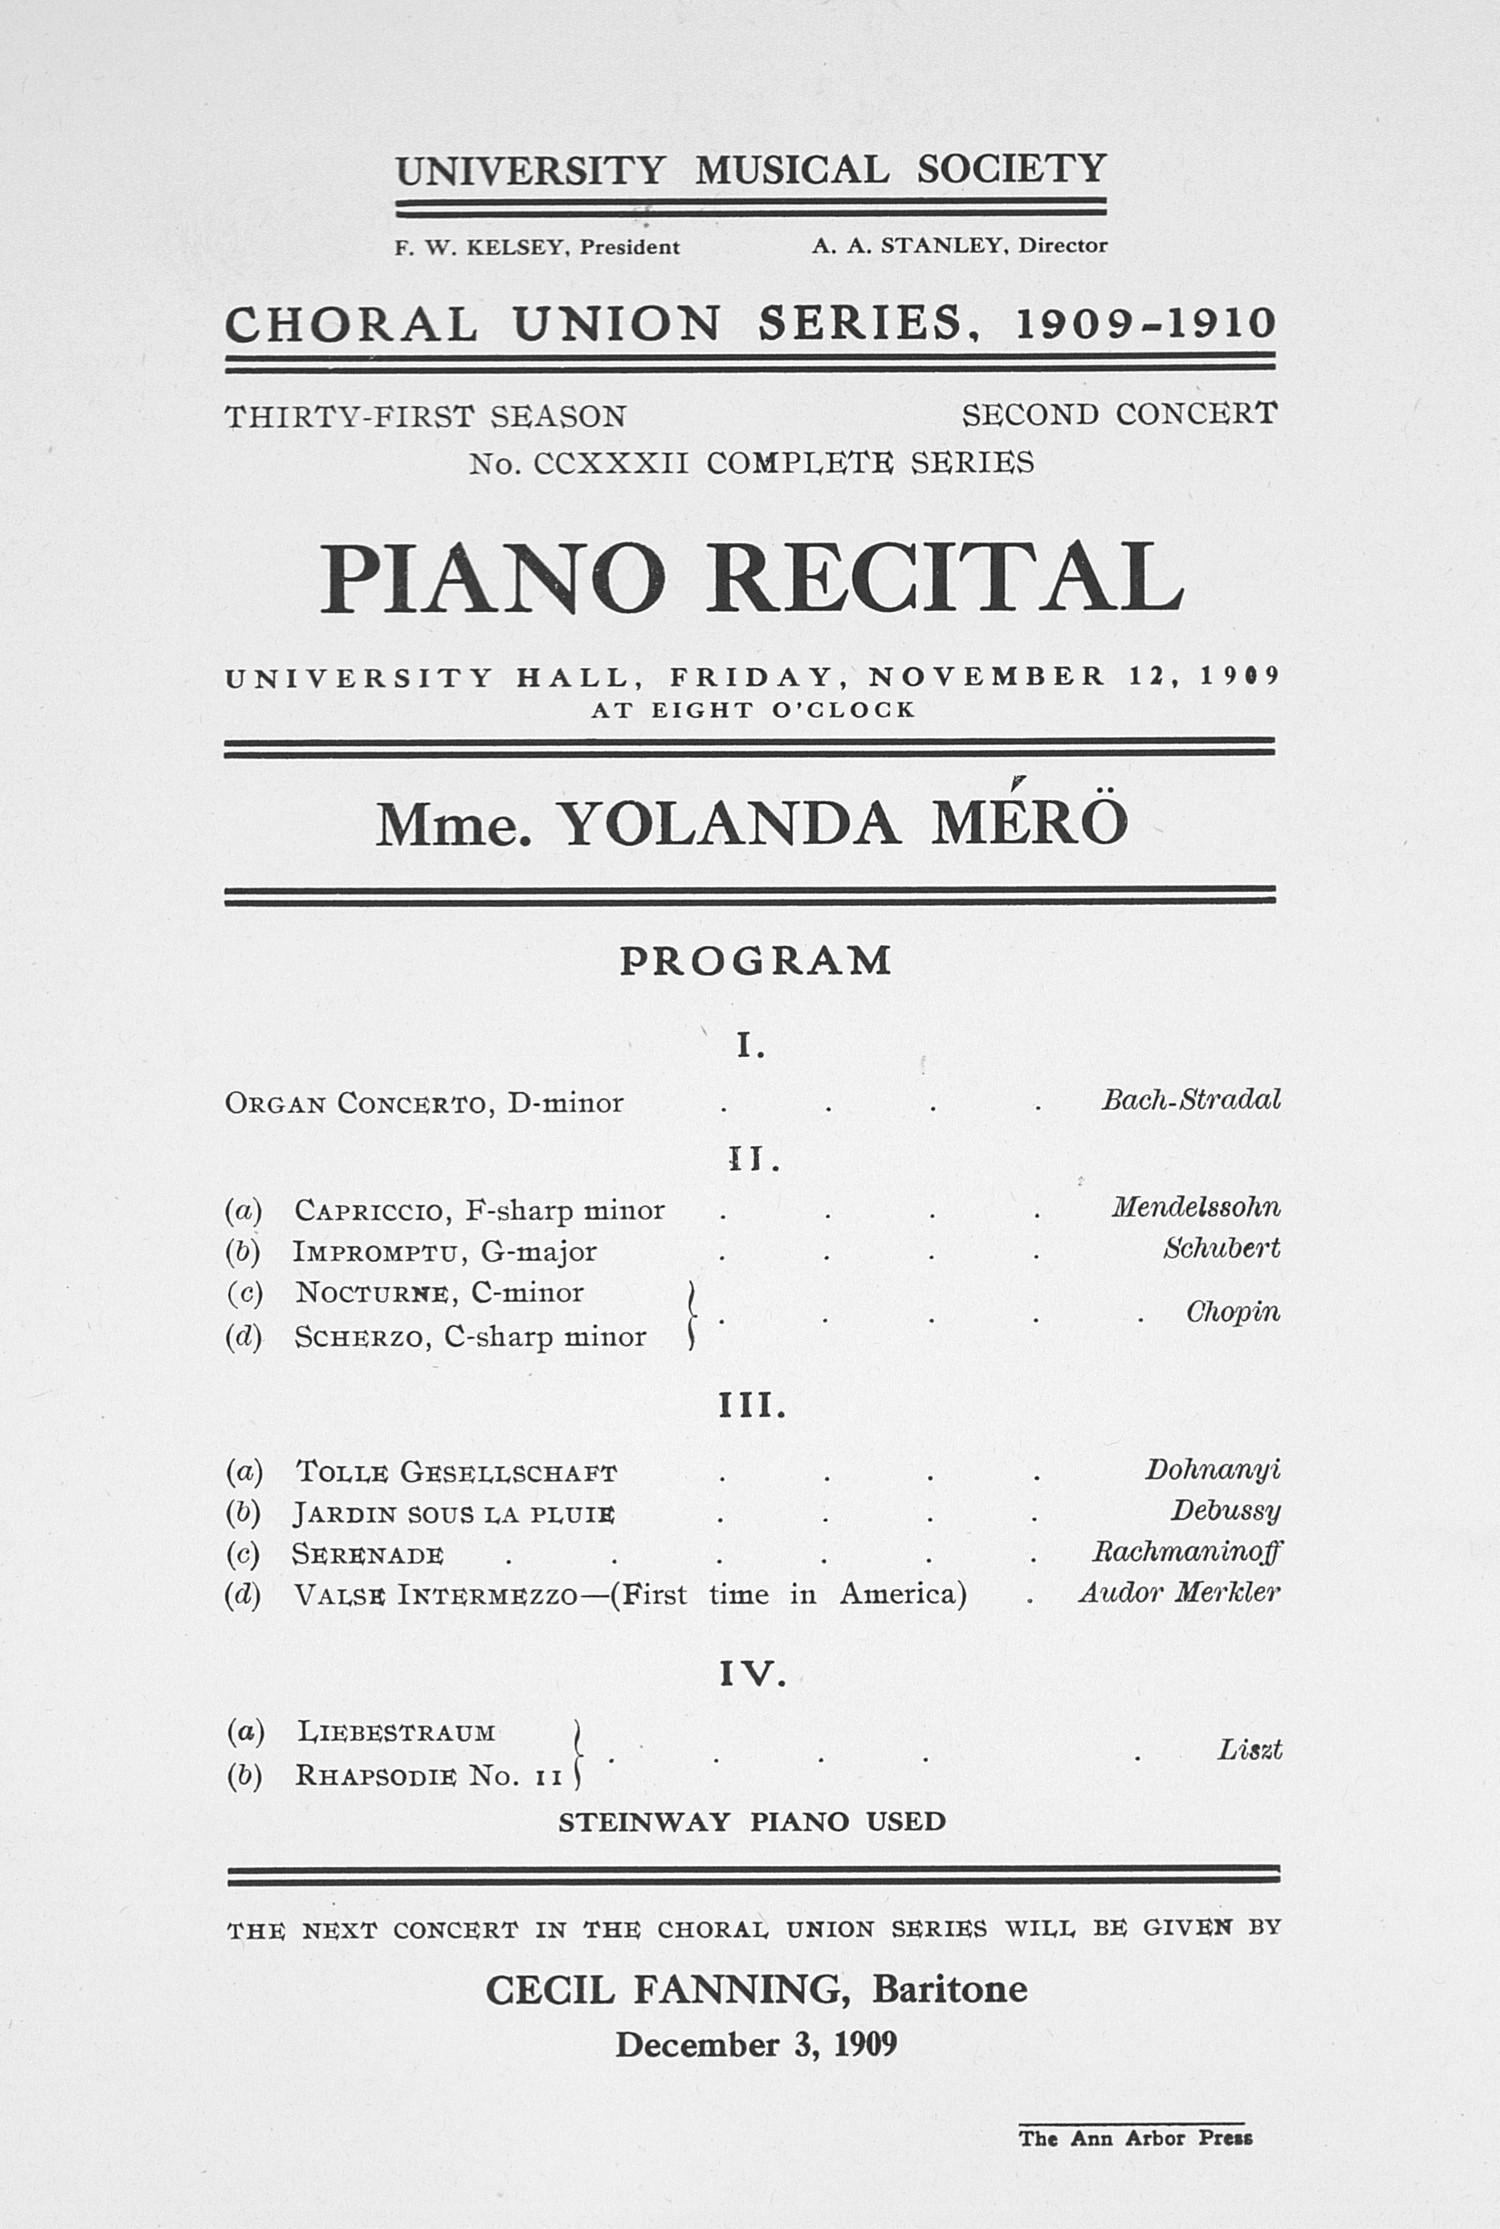 Piano Recital Program Template Free Luxury Recital Program Template Free